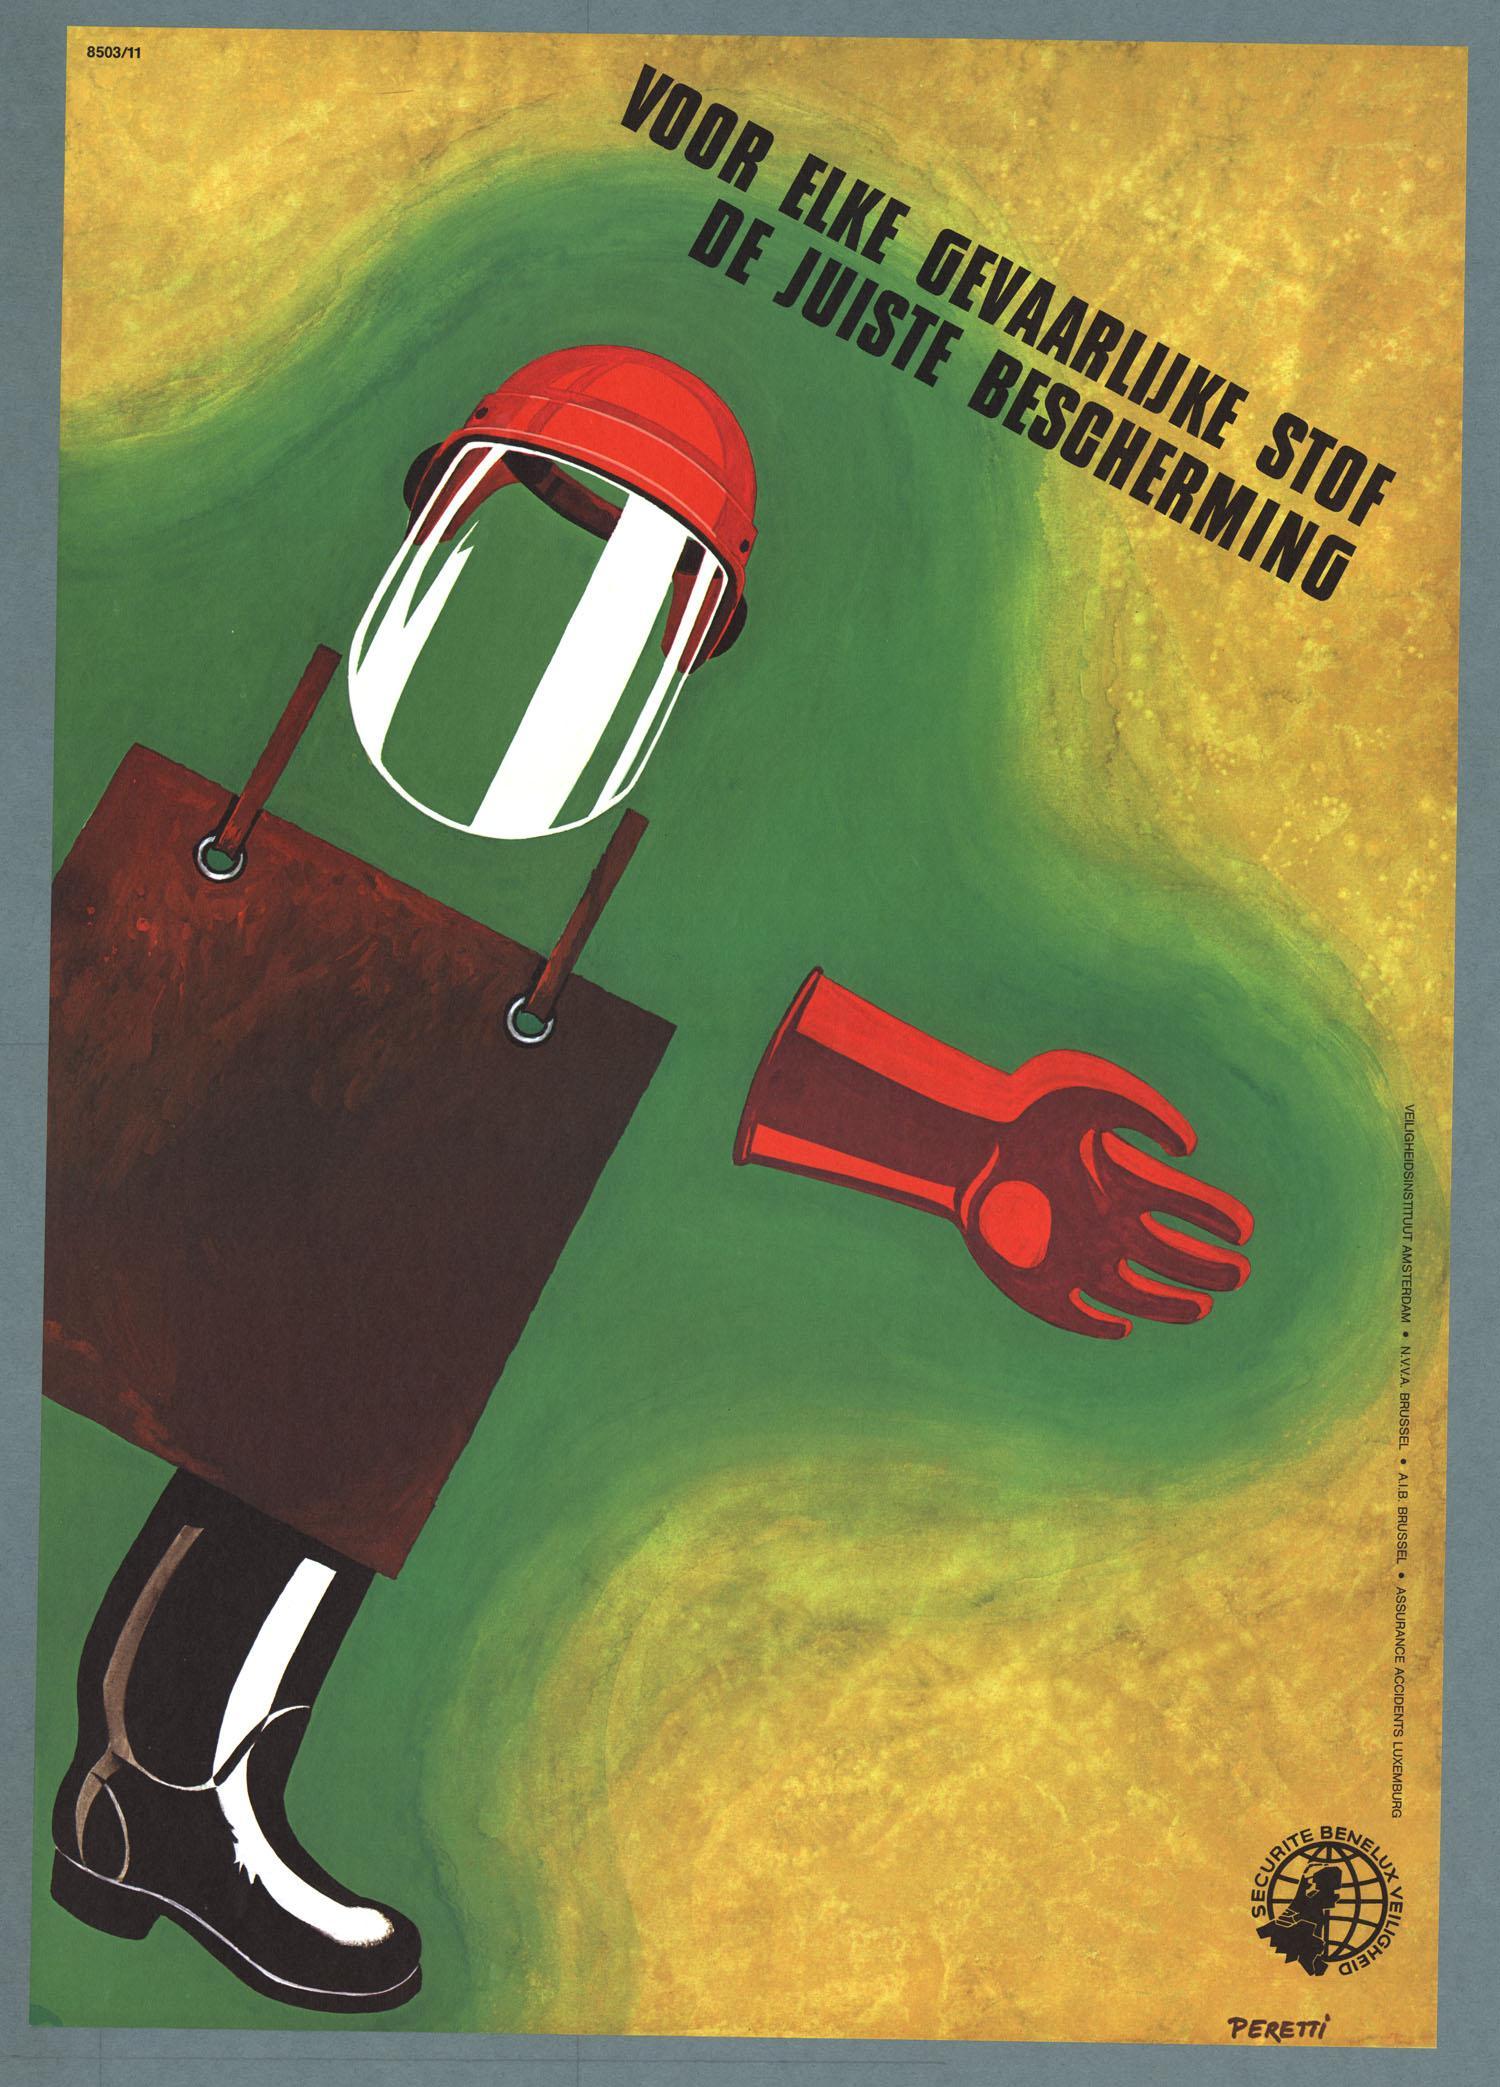 Top affiche-securite-pays-bas-05 - La boite verte YU91